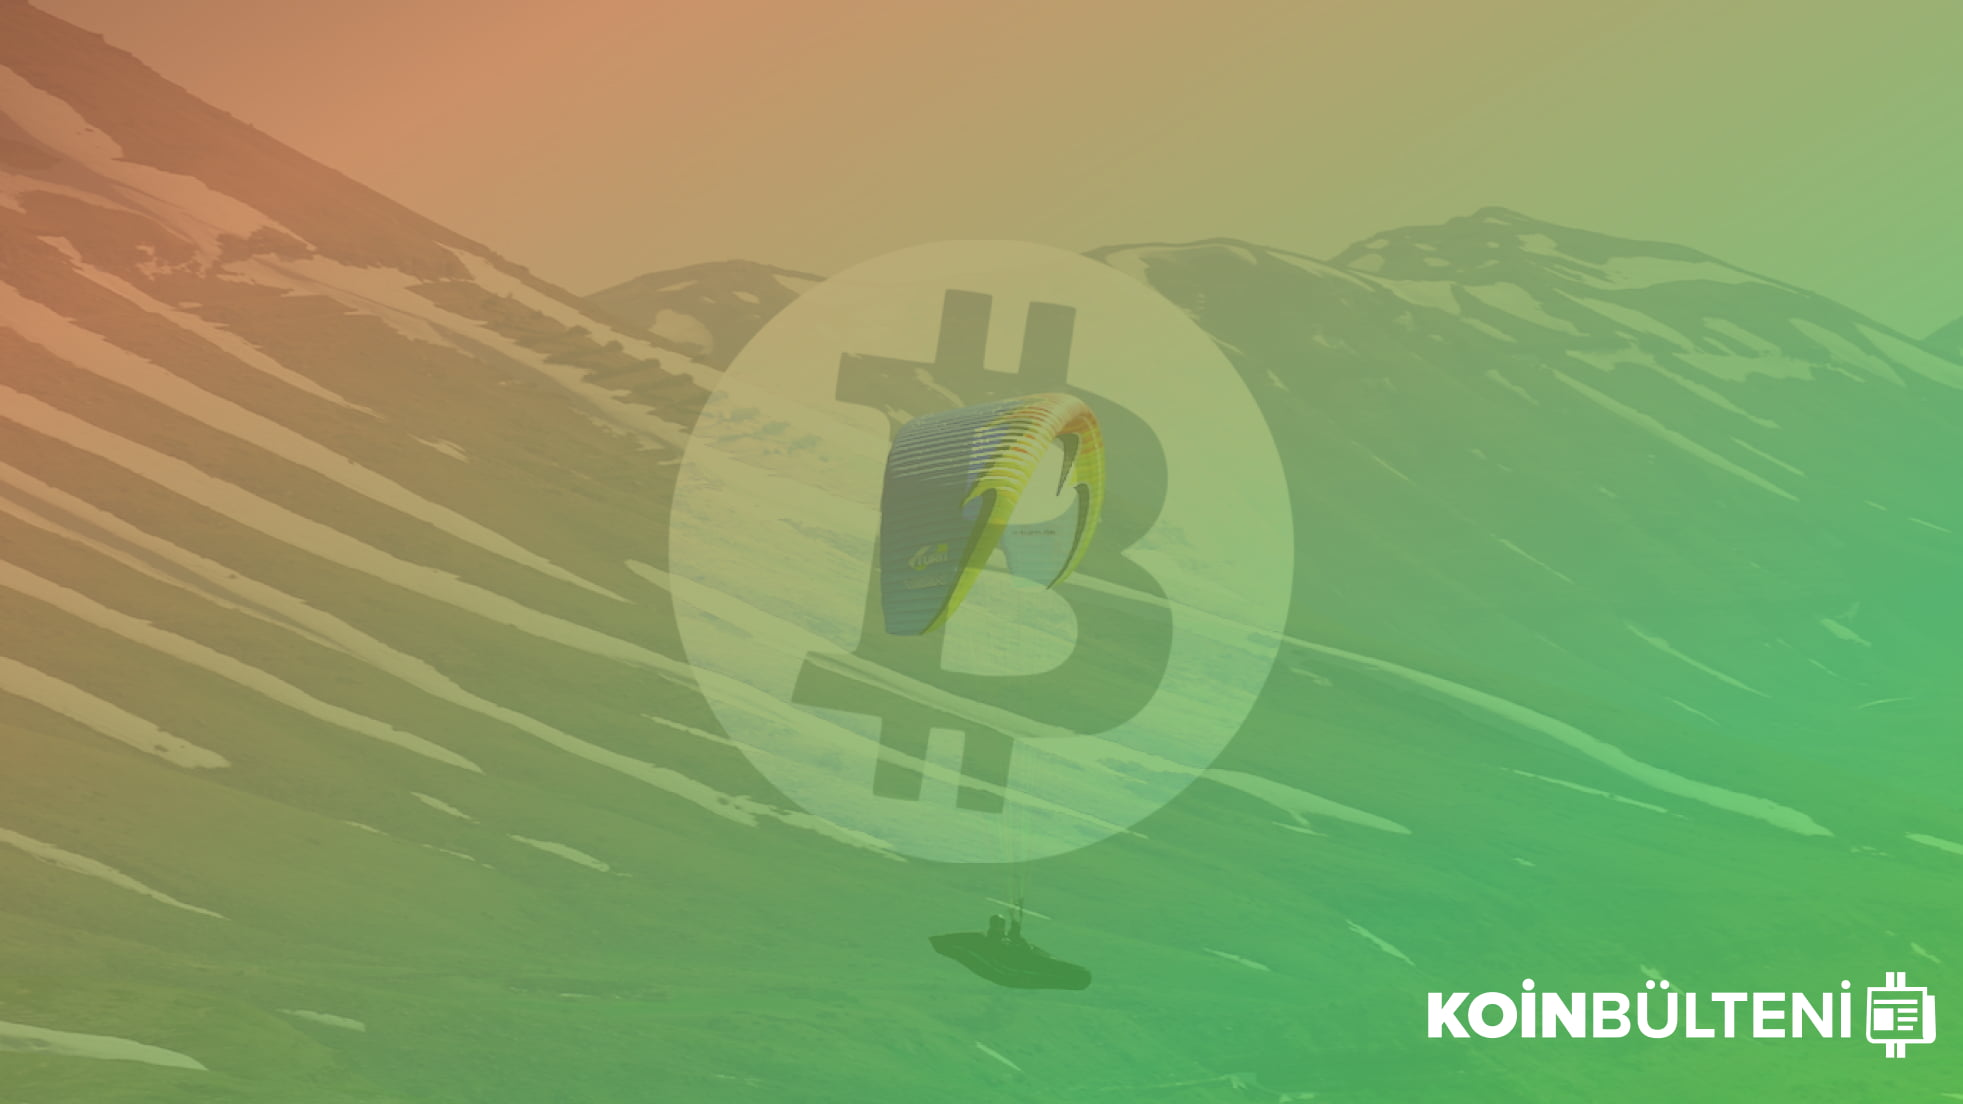 Bitcoin - Inigo Fraser-Jenkins